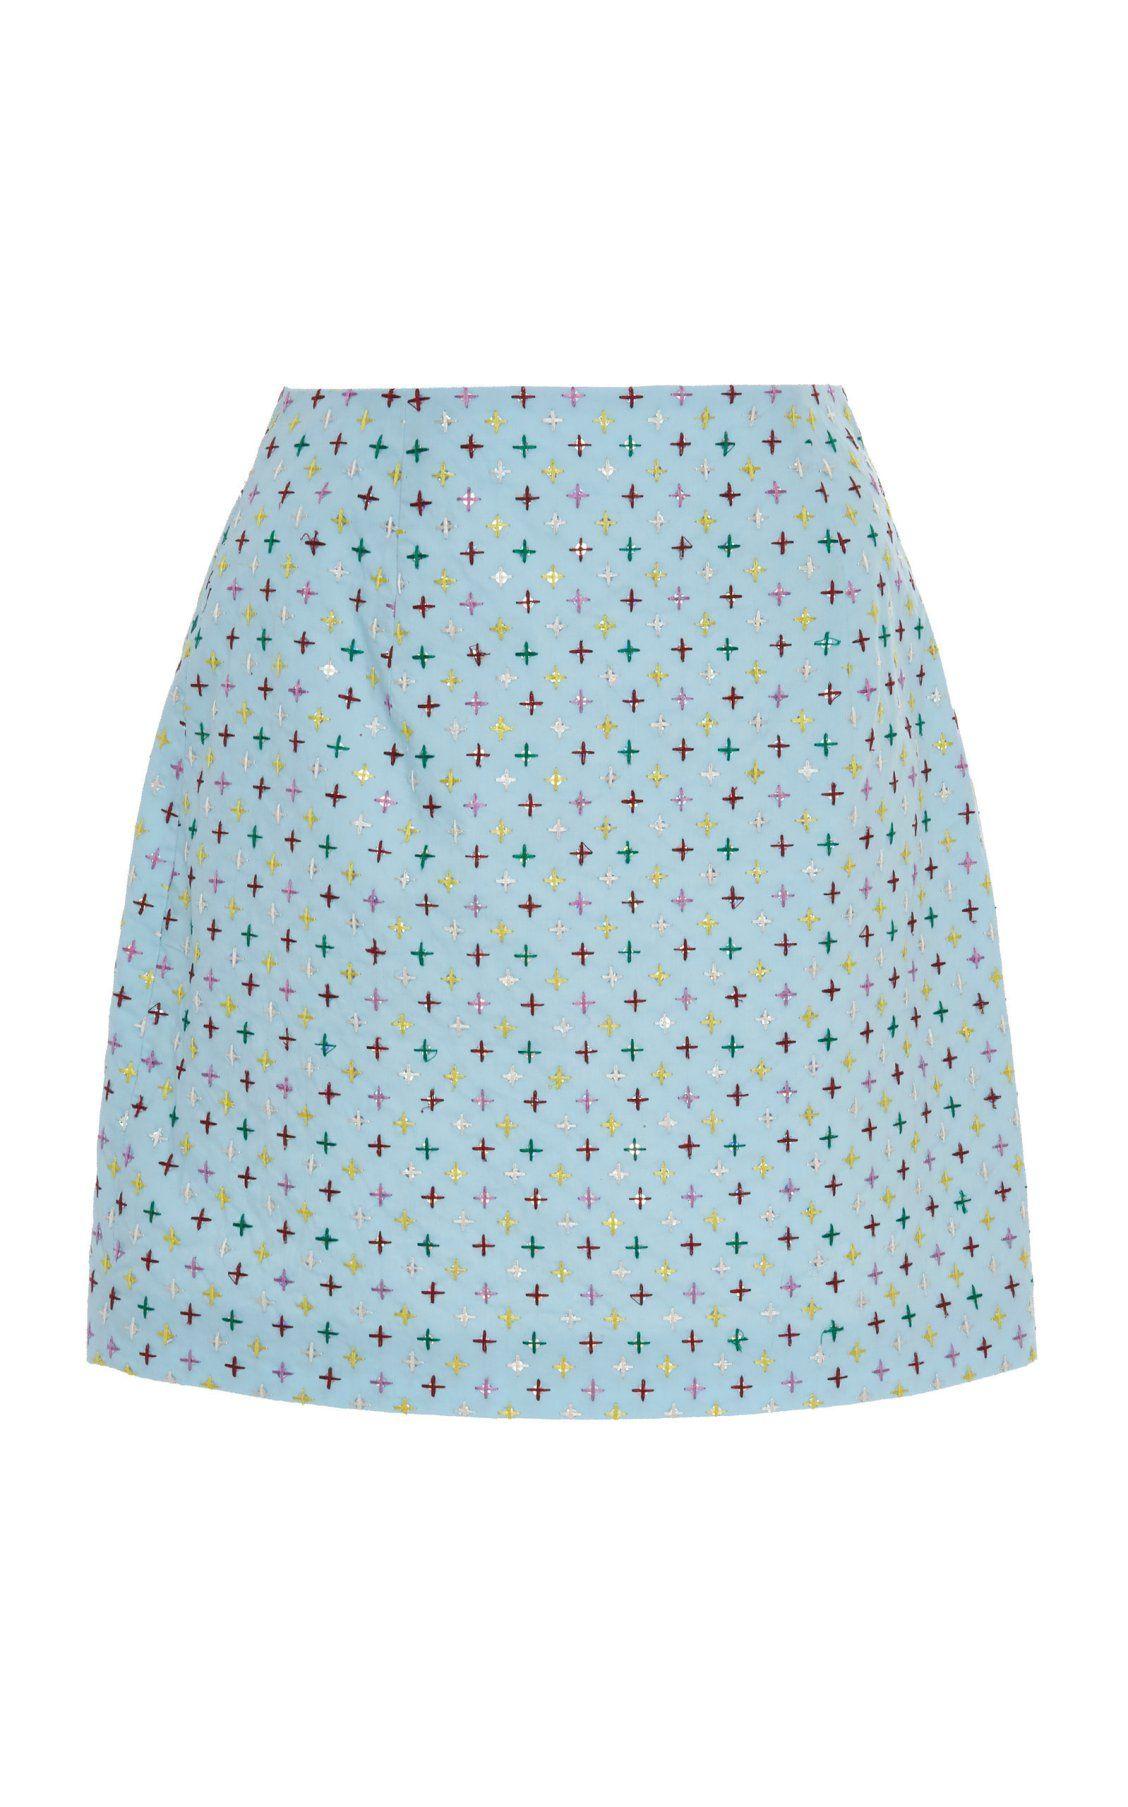 32ba3a510f95 Embroidered Cotton Mini Skirt by Markarian PF19   Moda Operandi ...